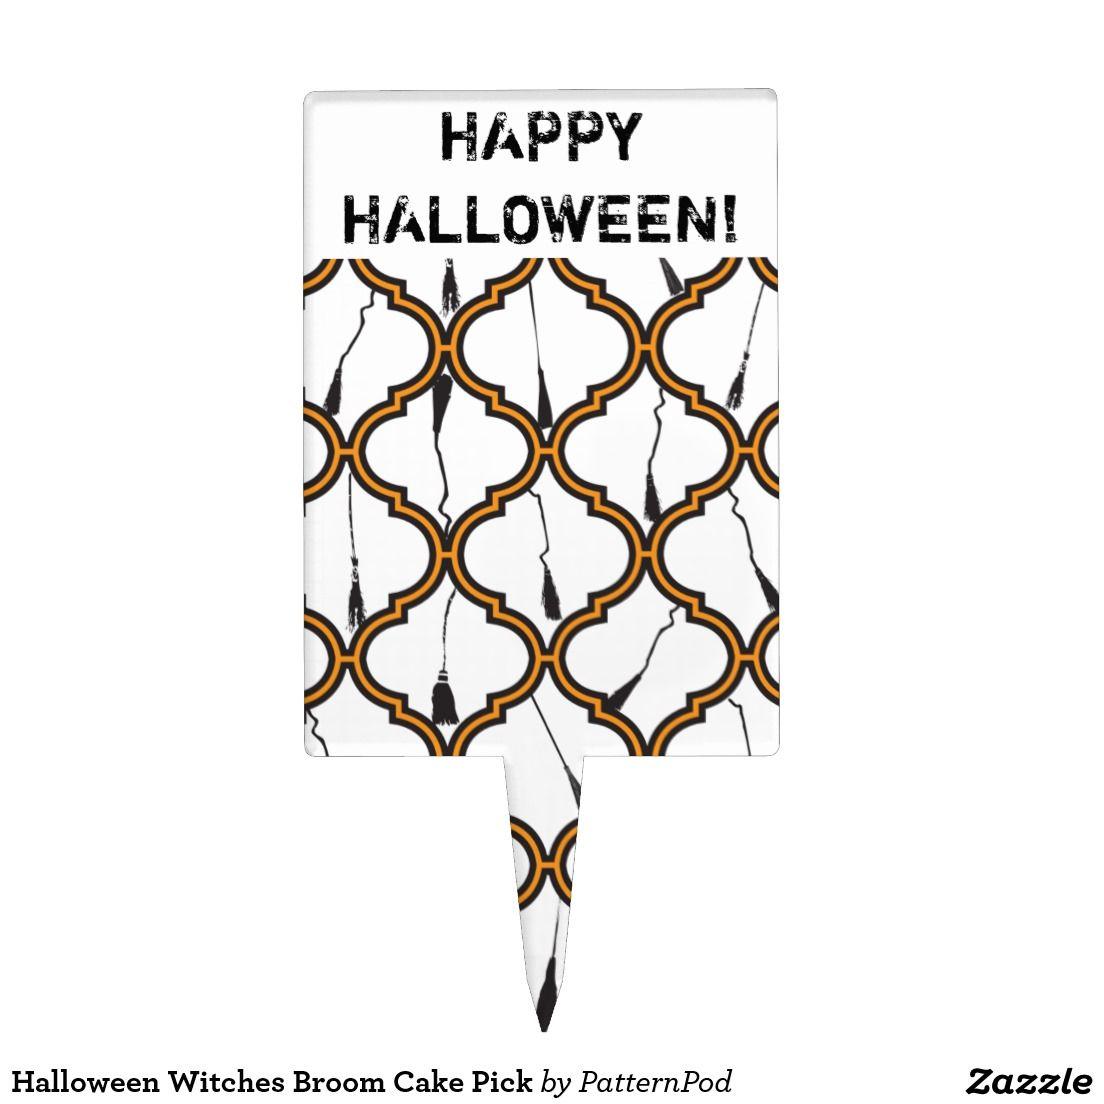 Halloween Witches Broom Cake Pick